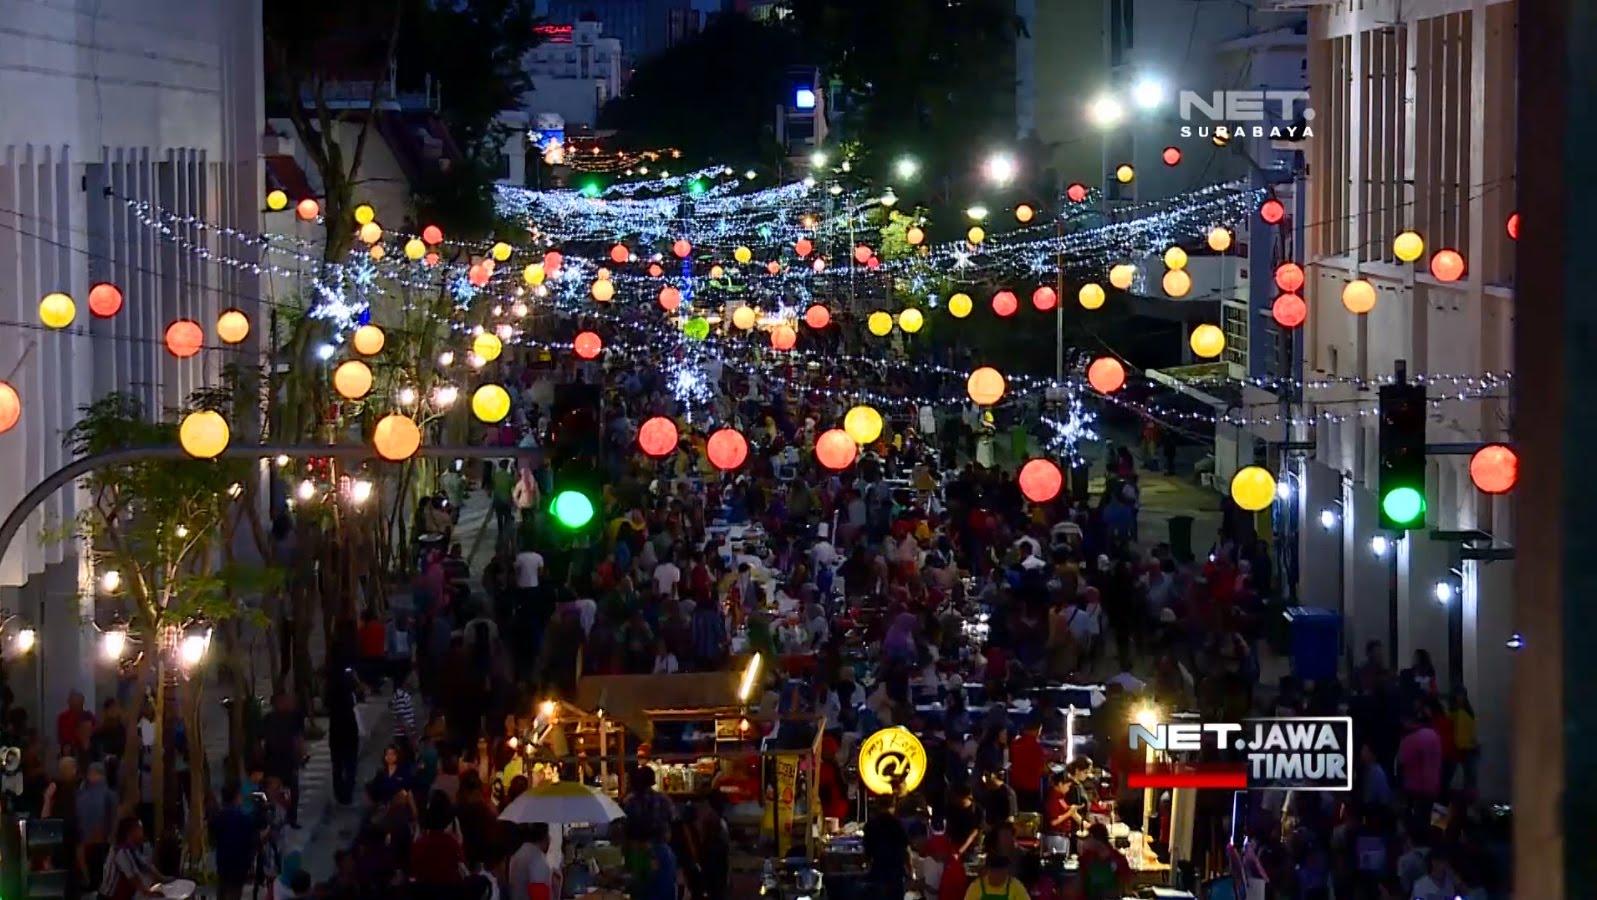 Net Jatim Kemeriahan Festival Jalan Tunjungan Youtube Kota Surabaya